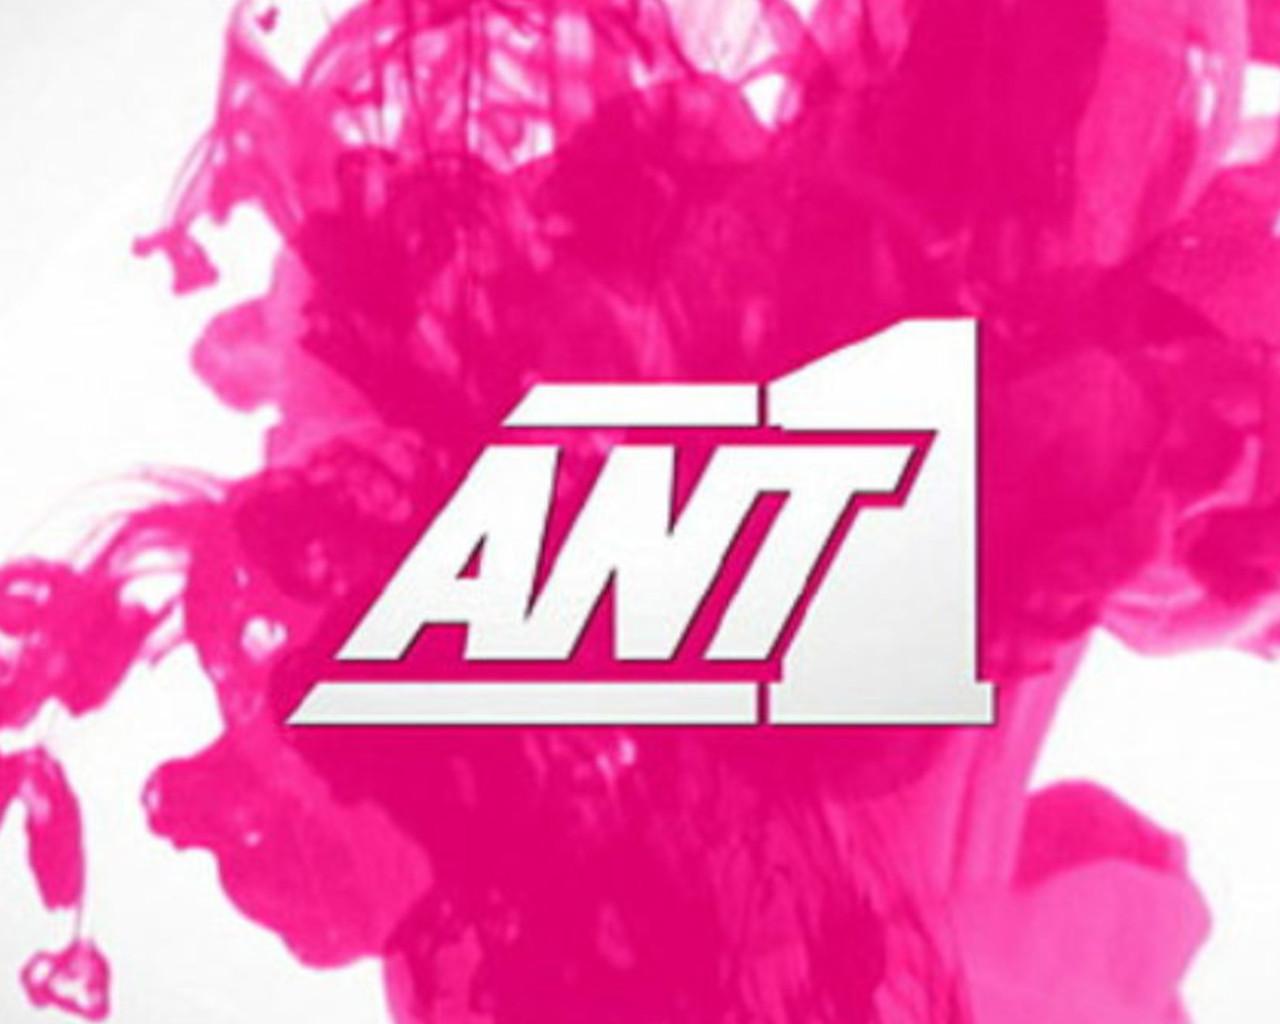 ant1,ant1 επεισοδια,ant1 καναλι,ant1 live